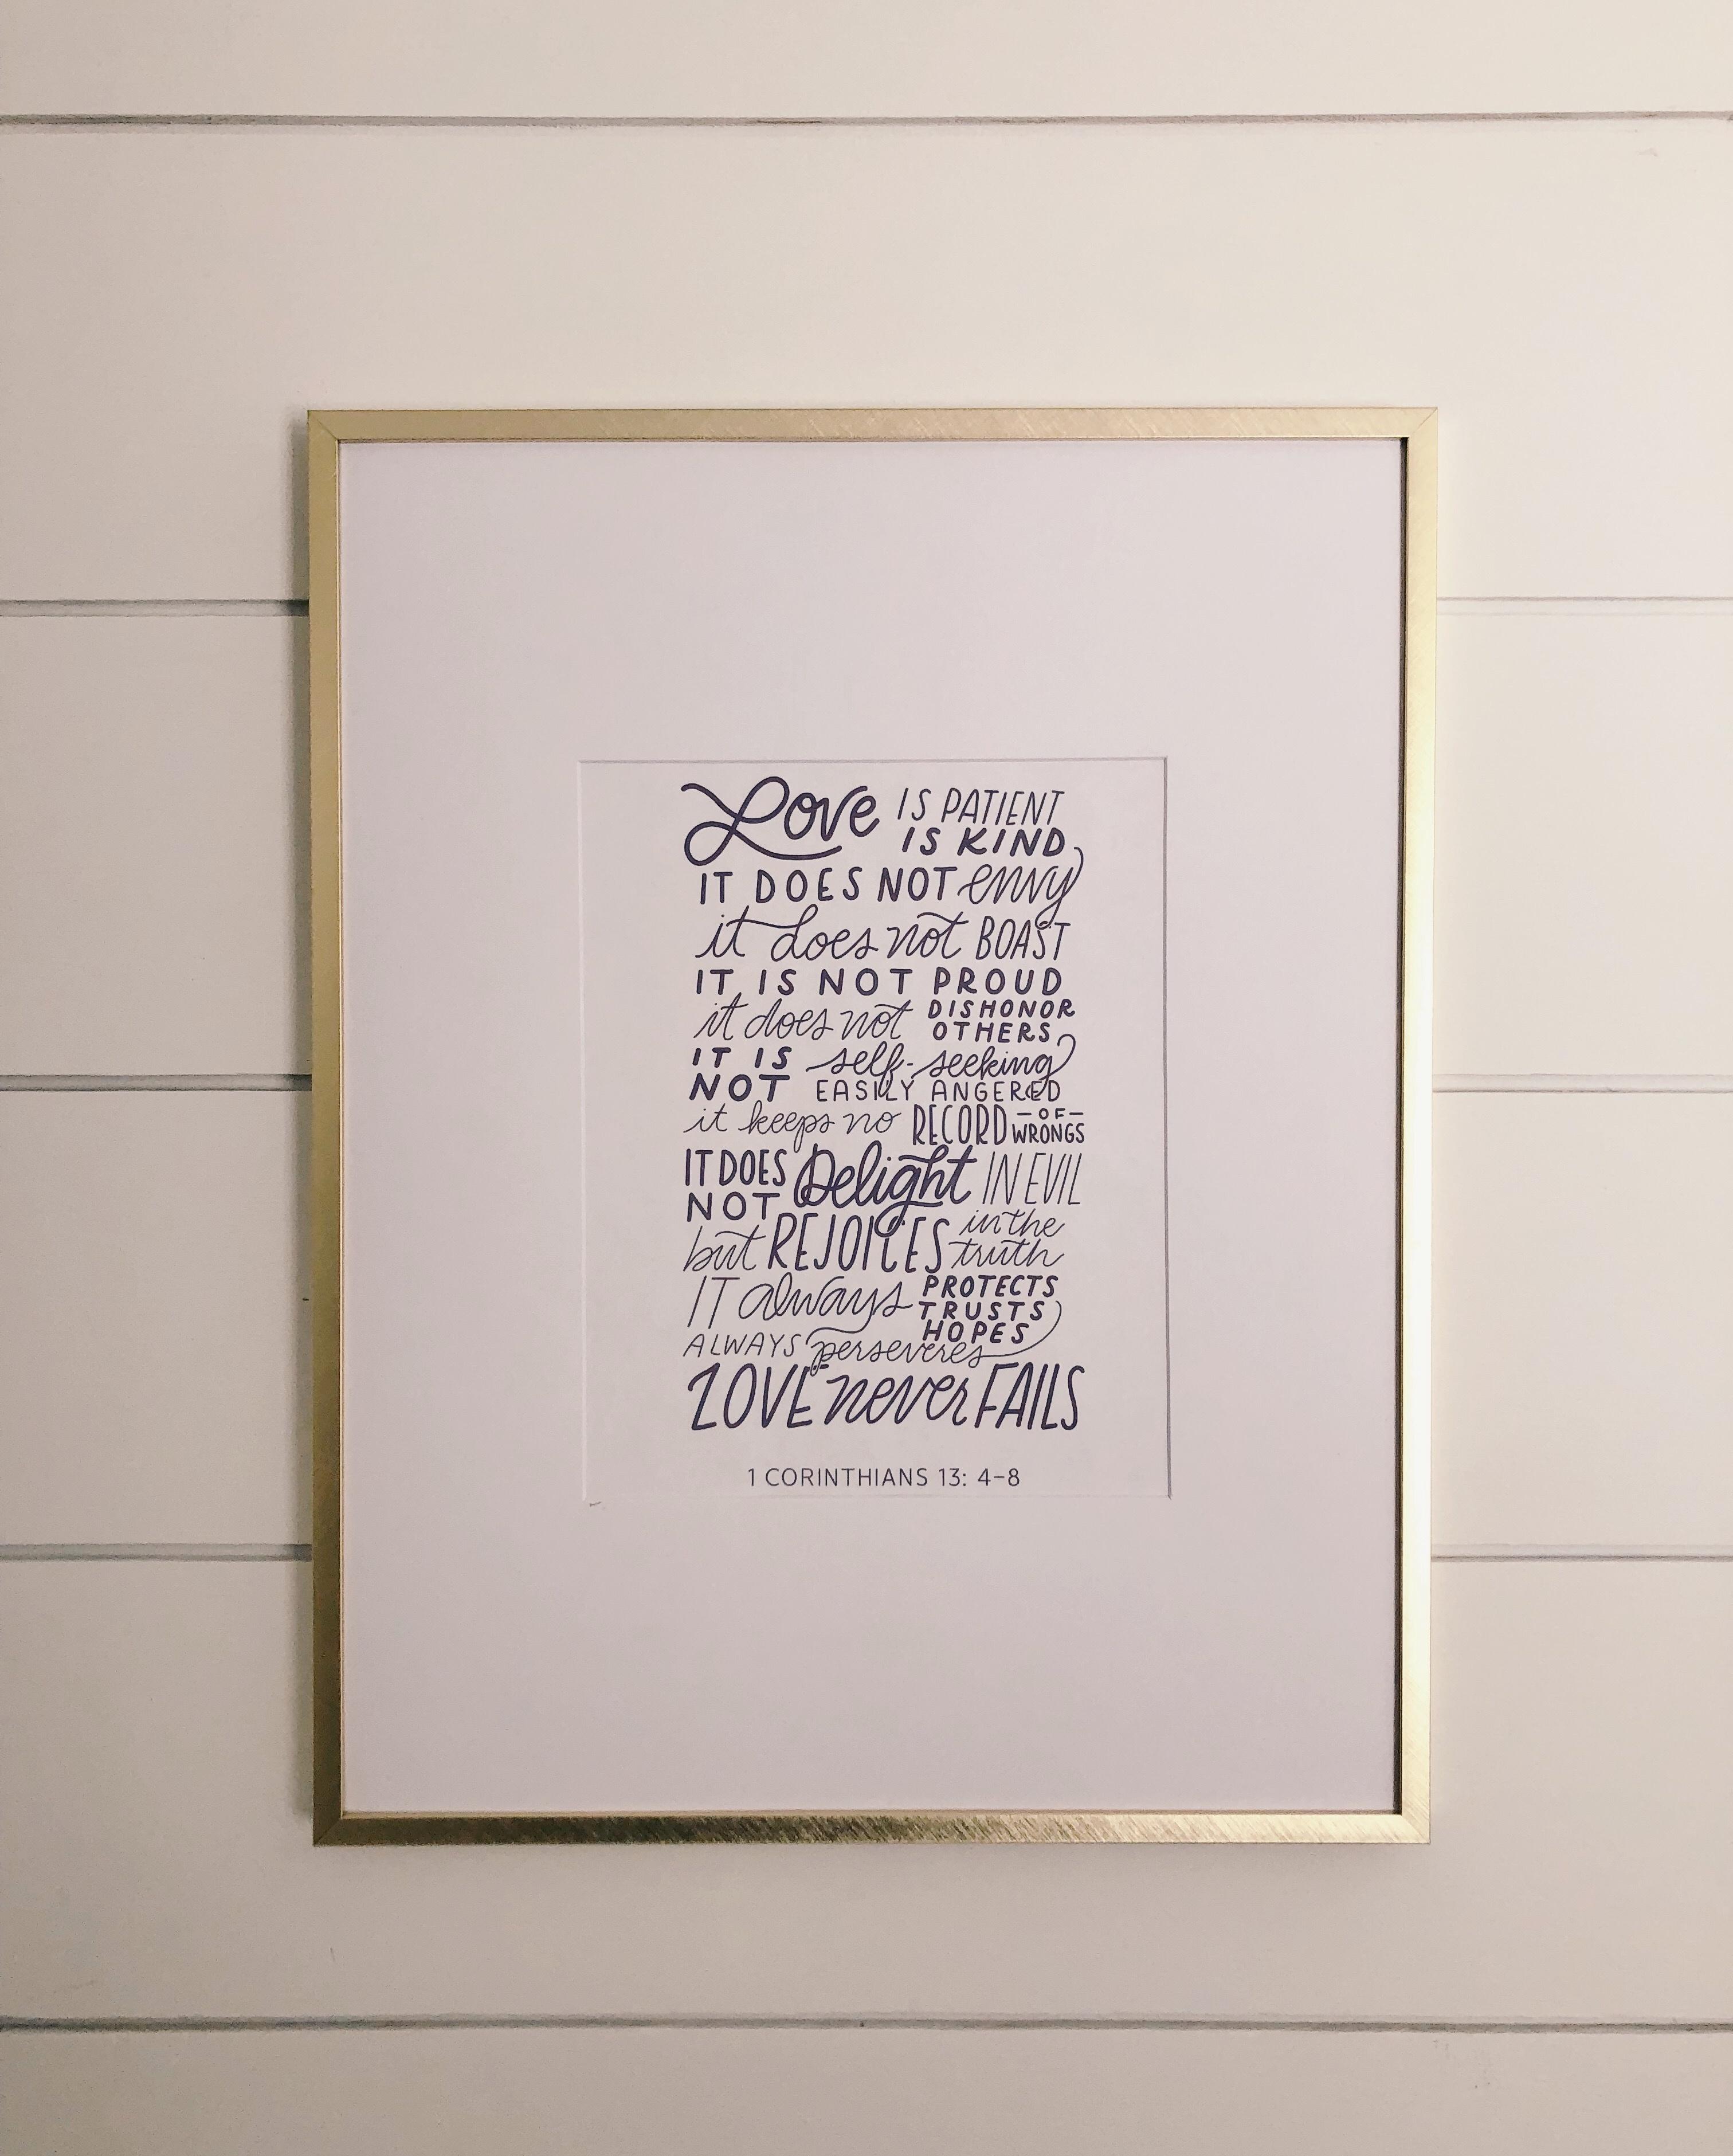 Love Is Patient, Love Is Kind | Free Printable | Harbor + Pine - Love Is Patient Free Printable